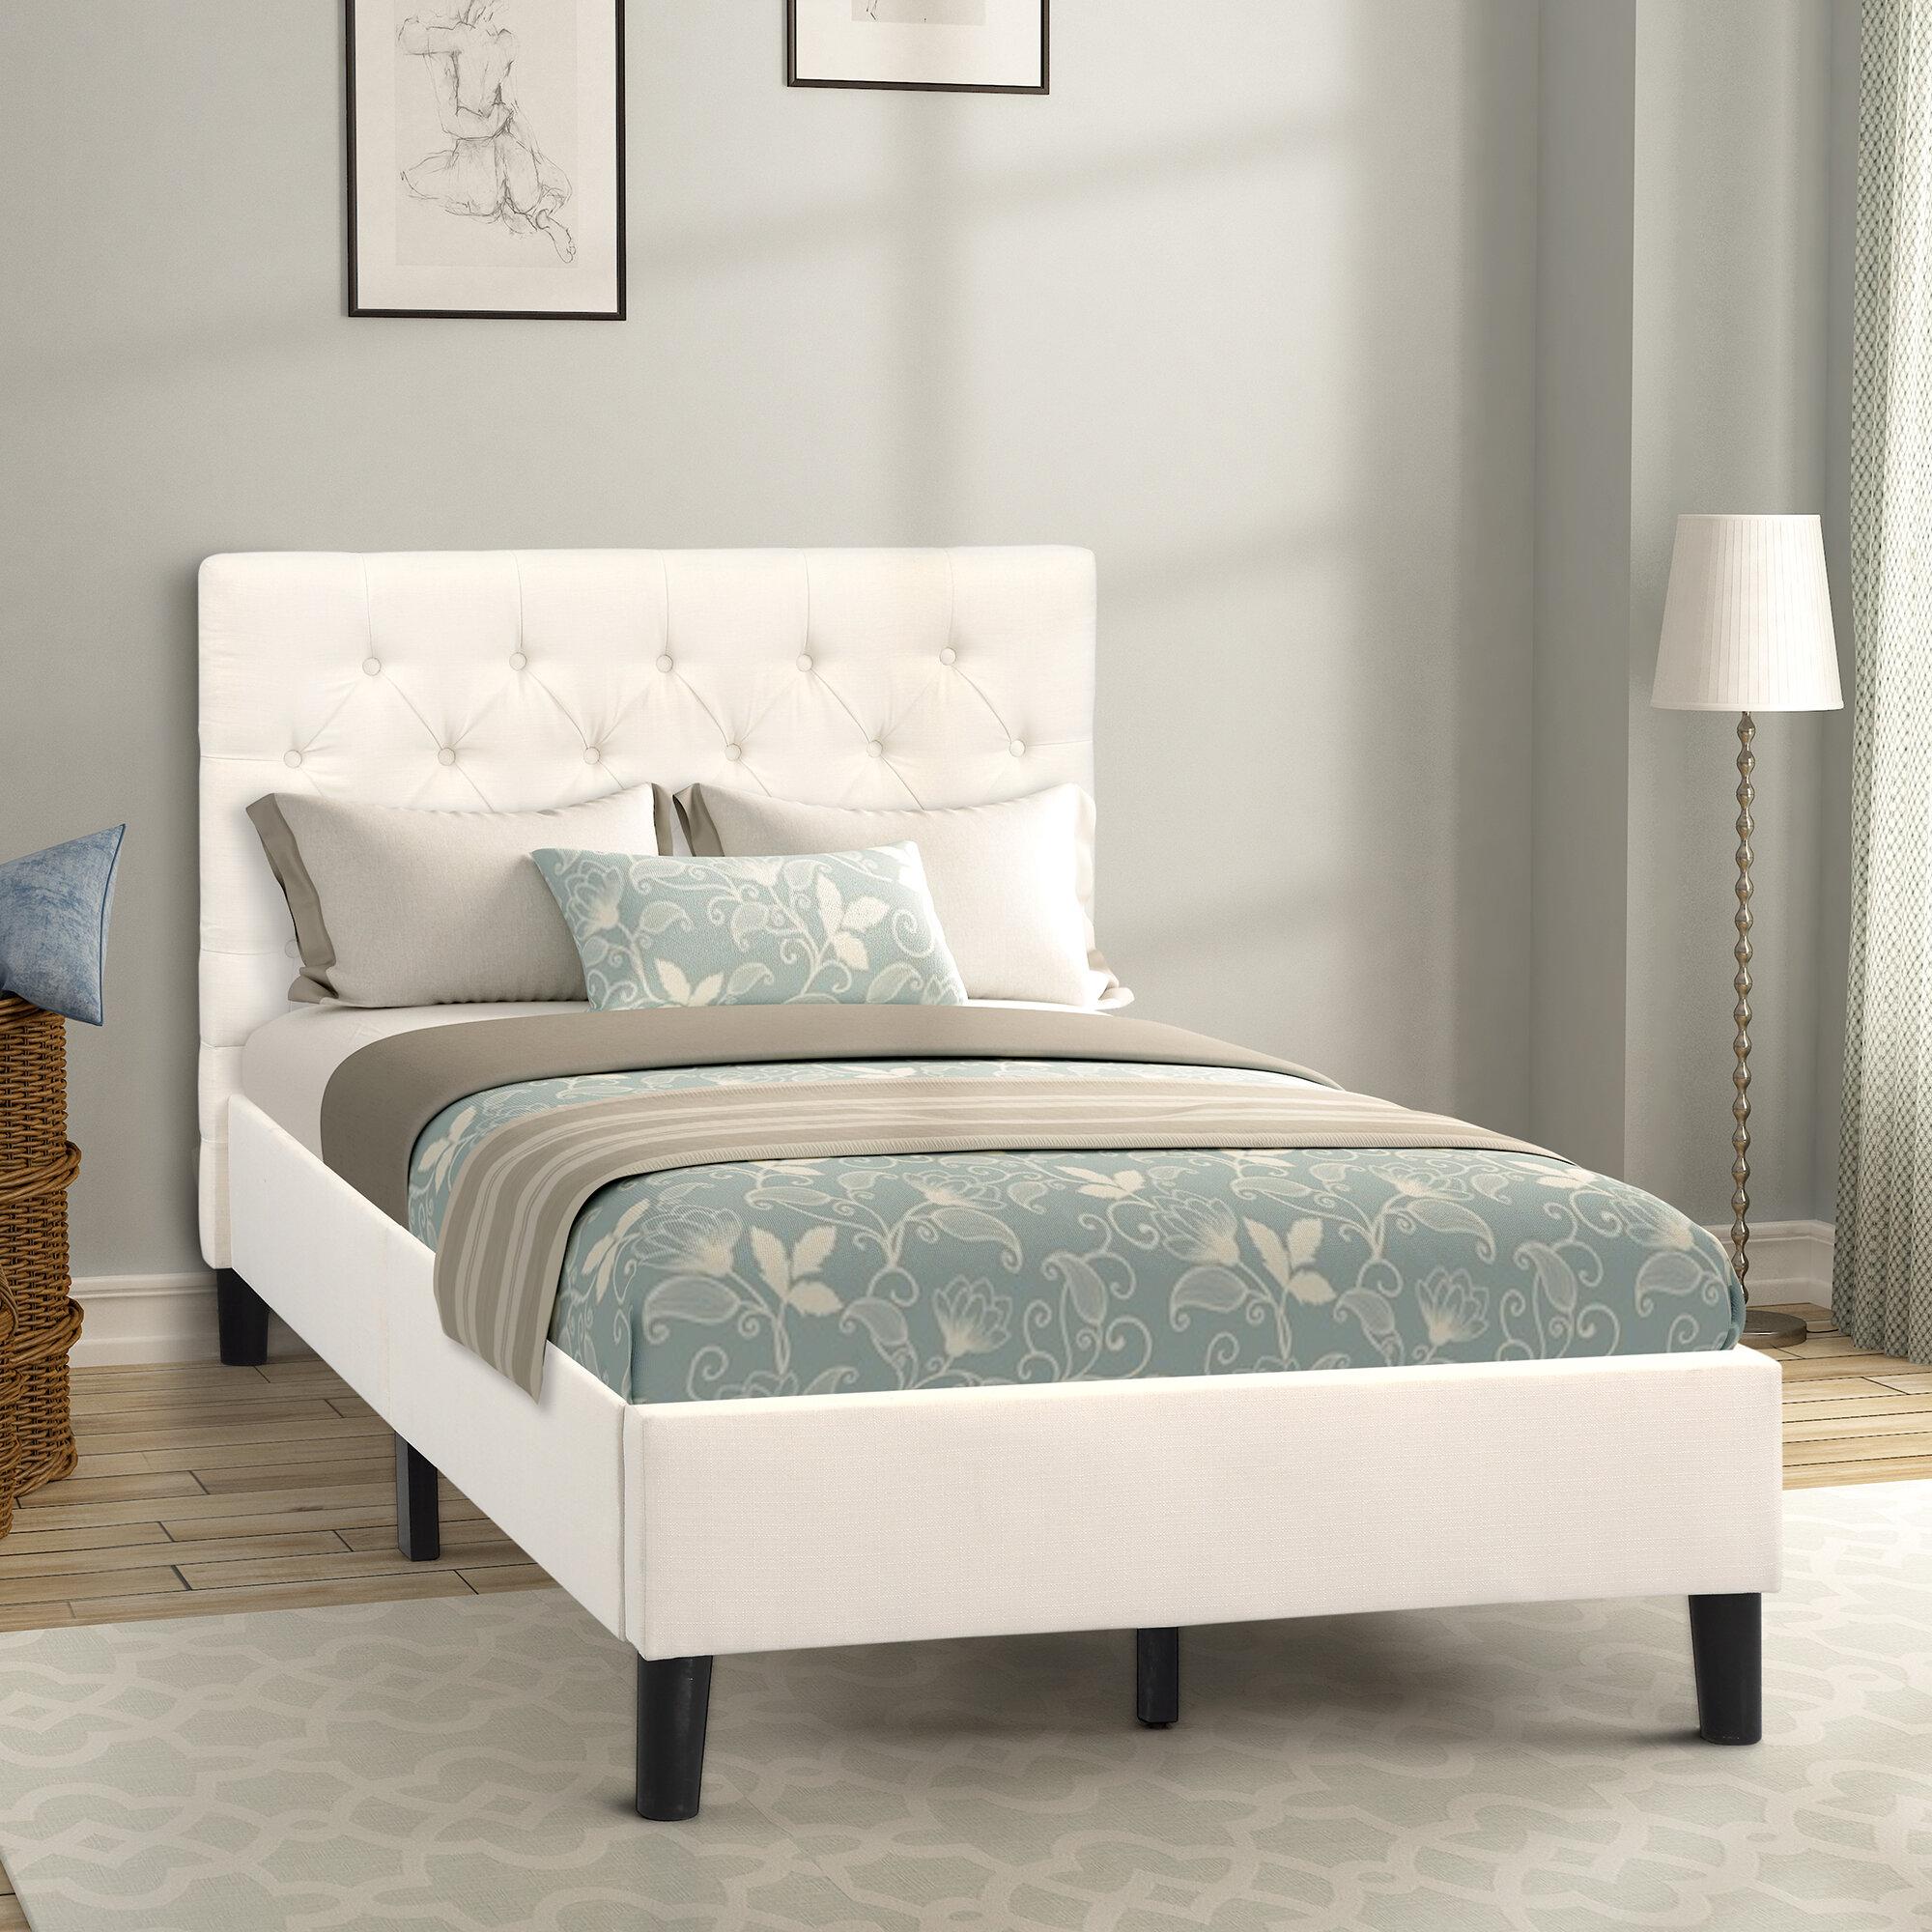 Latitude Run Akkie Tufted Upholstered Low Profile Platform Bed Wayfair